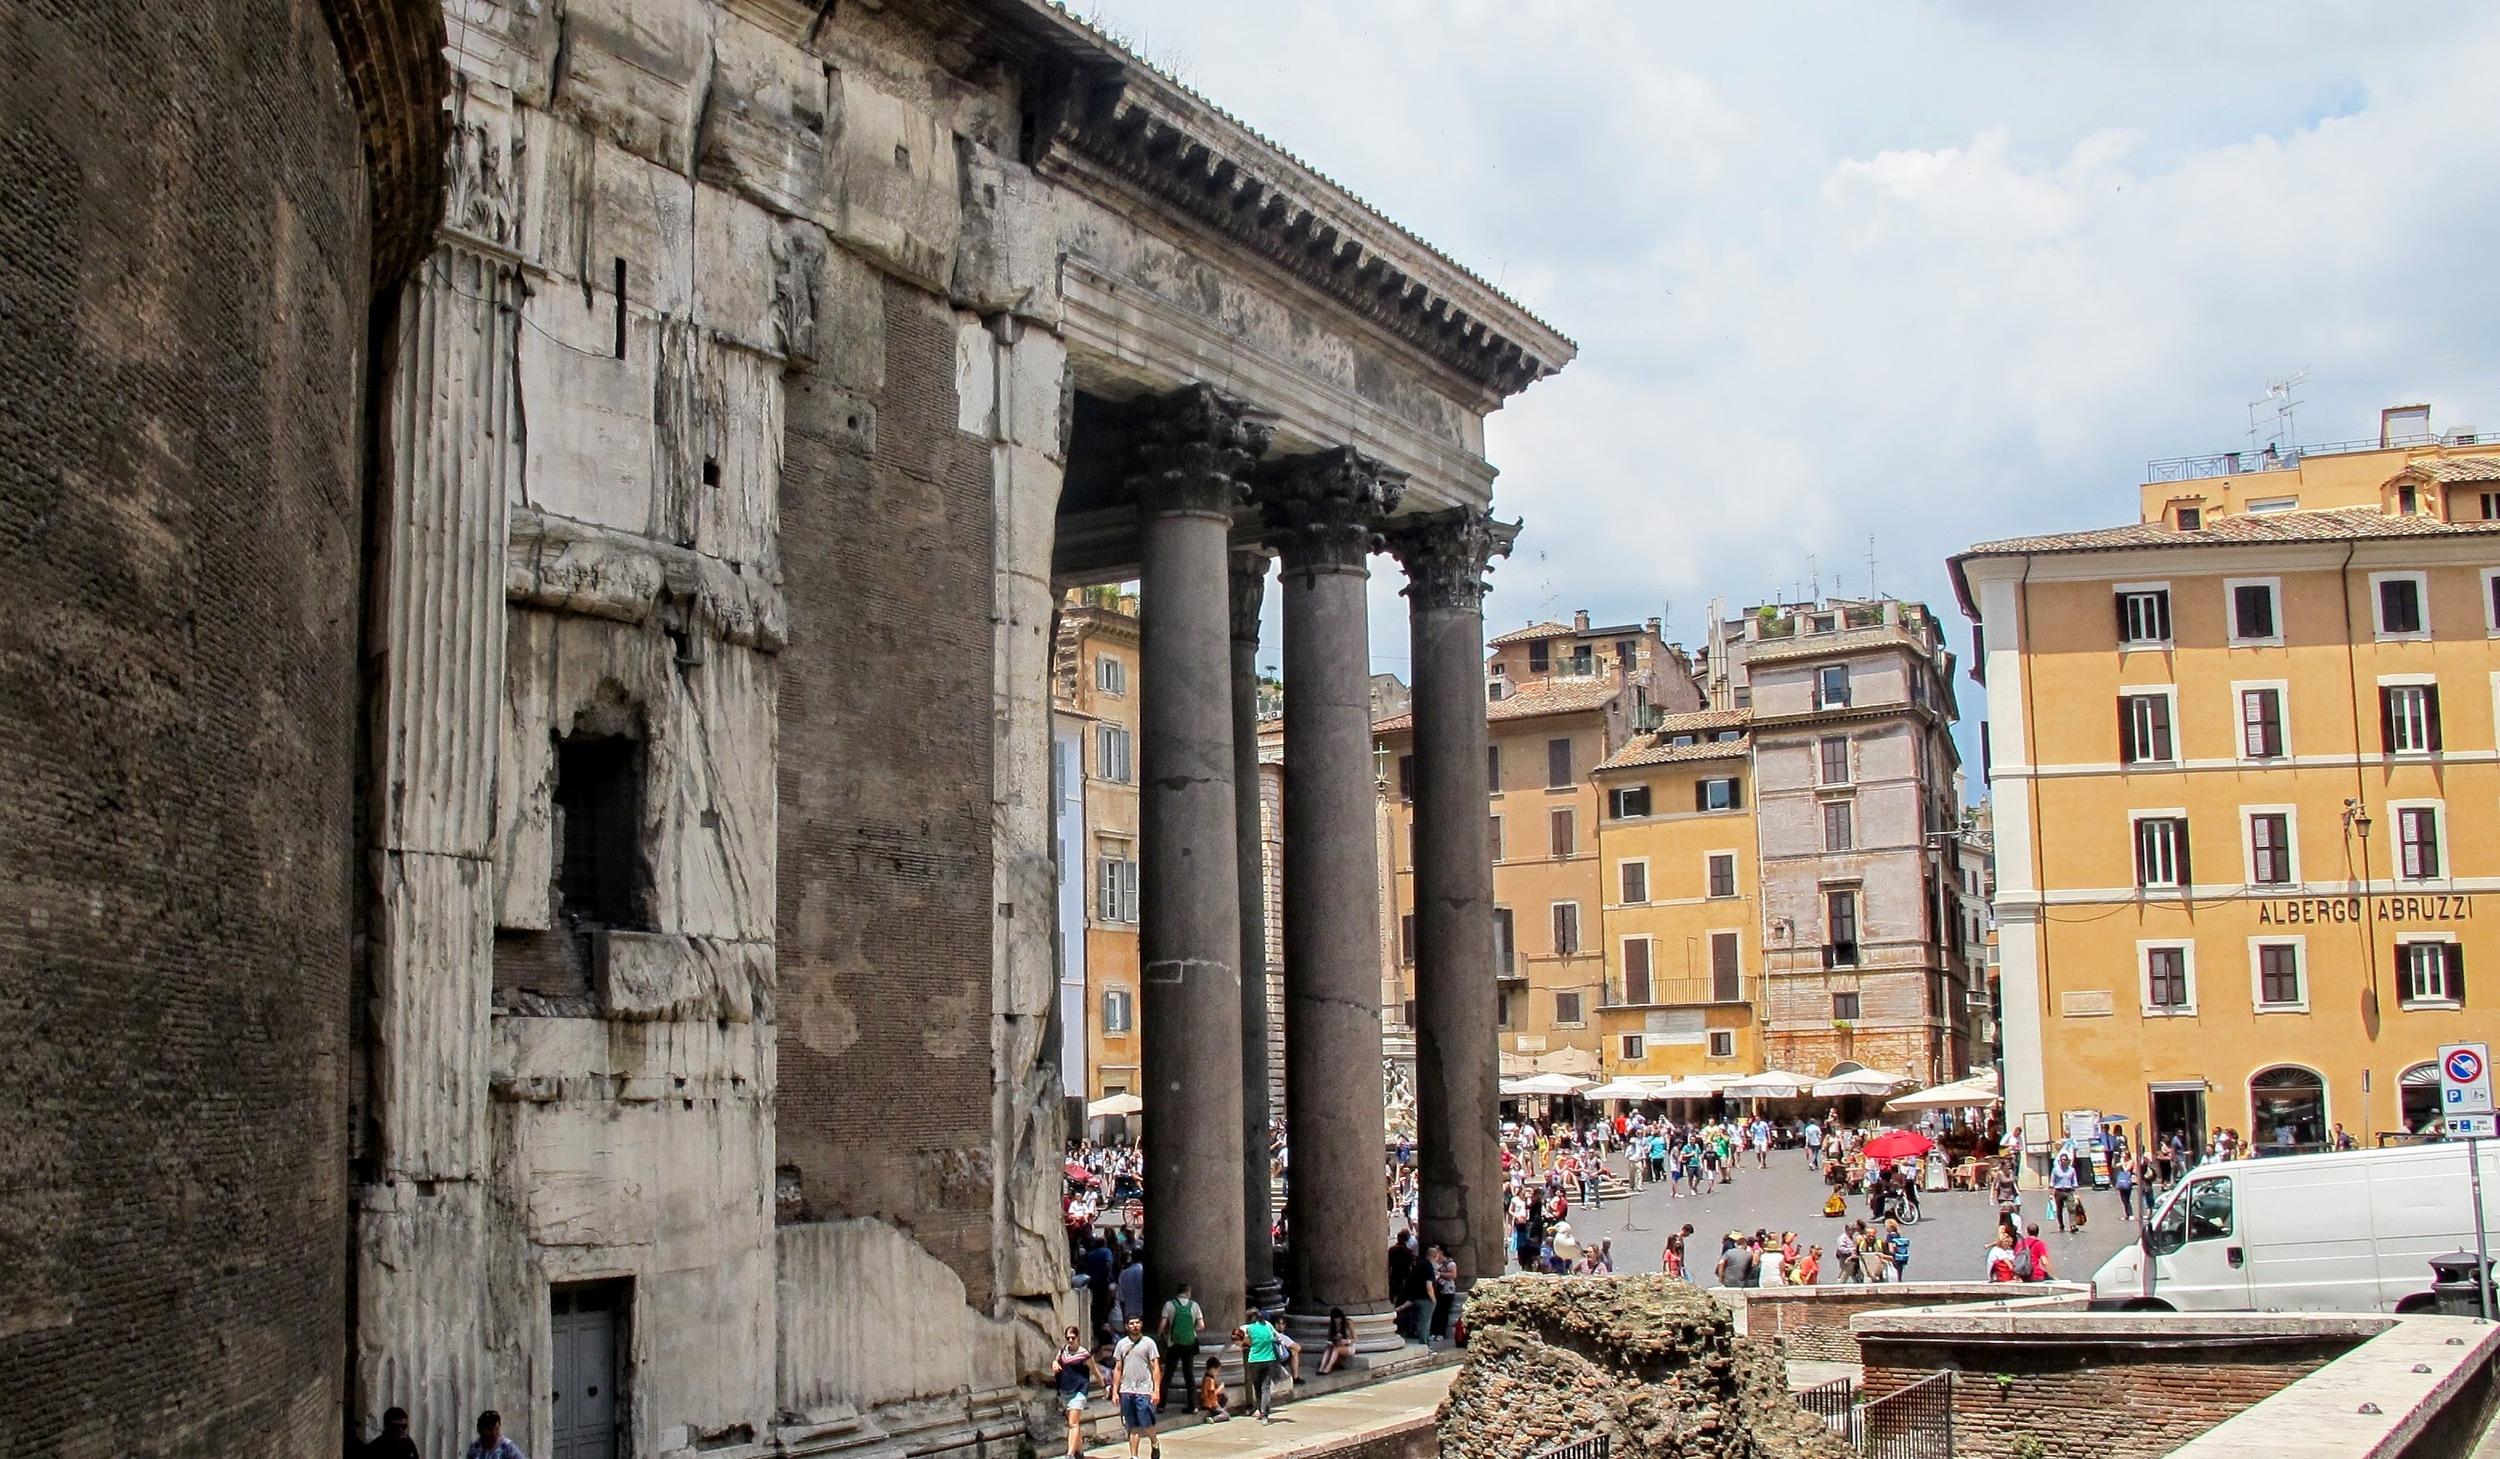 Pantheon, Rome Italy